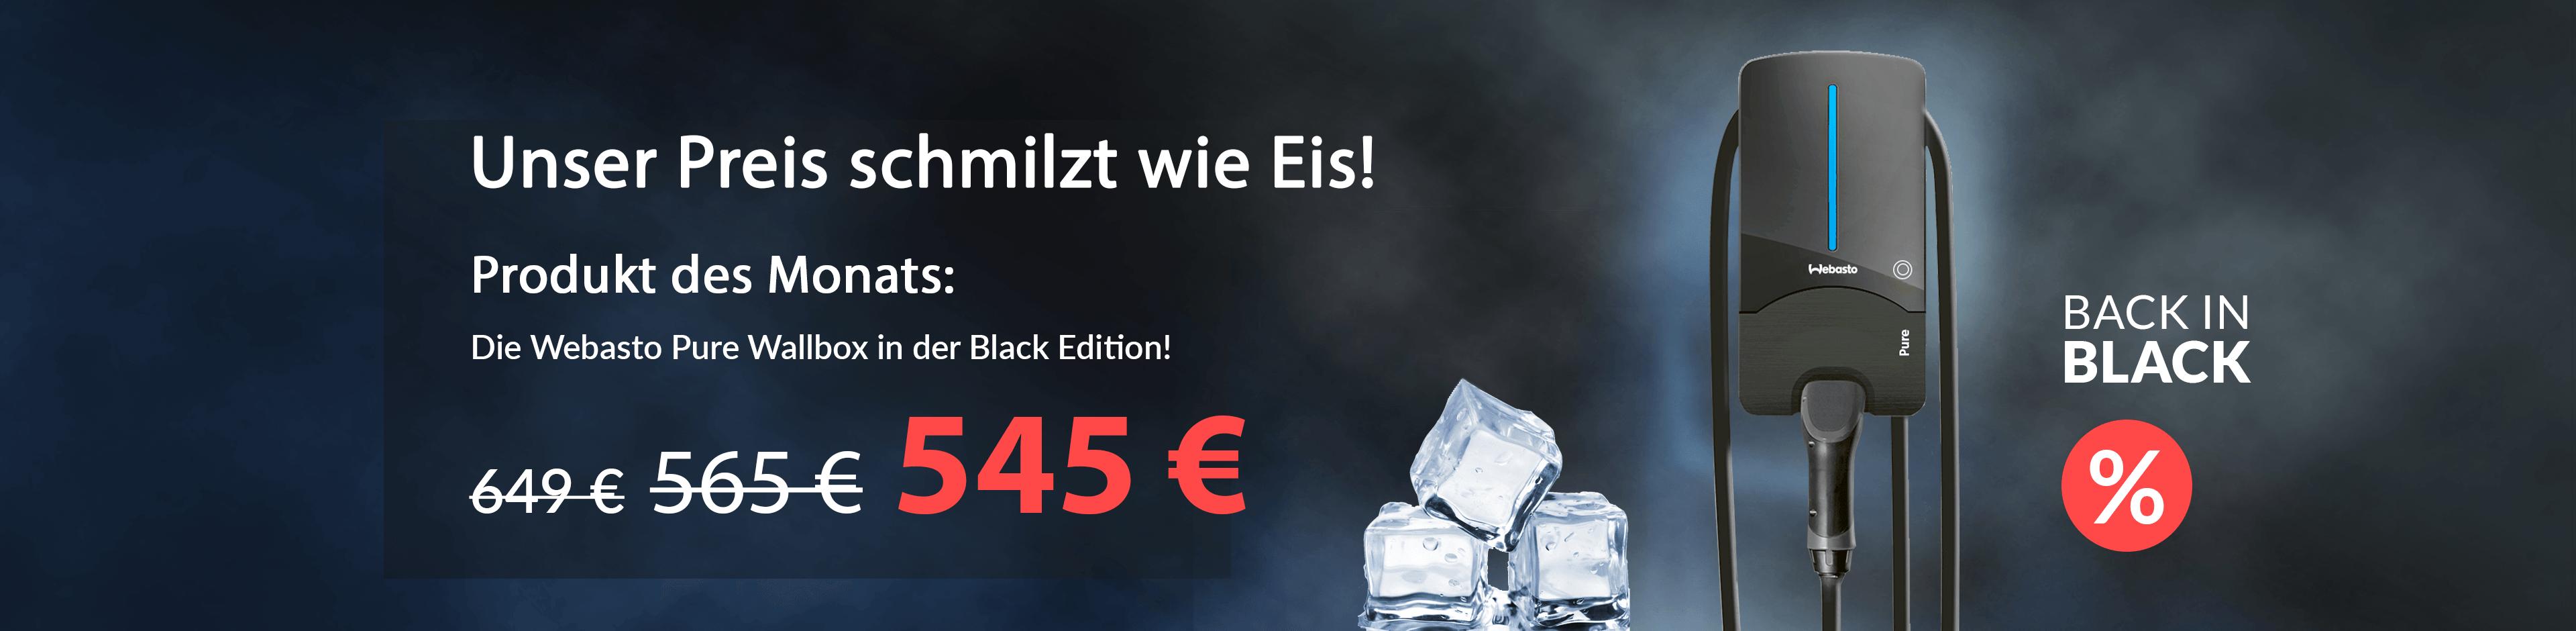 Produkt des Monats: Webasto Pure Wallbox 11kW Black Edition